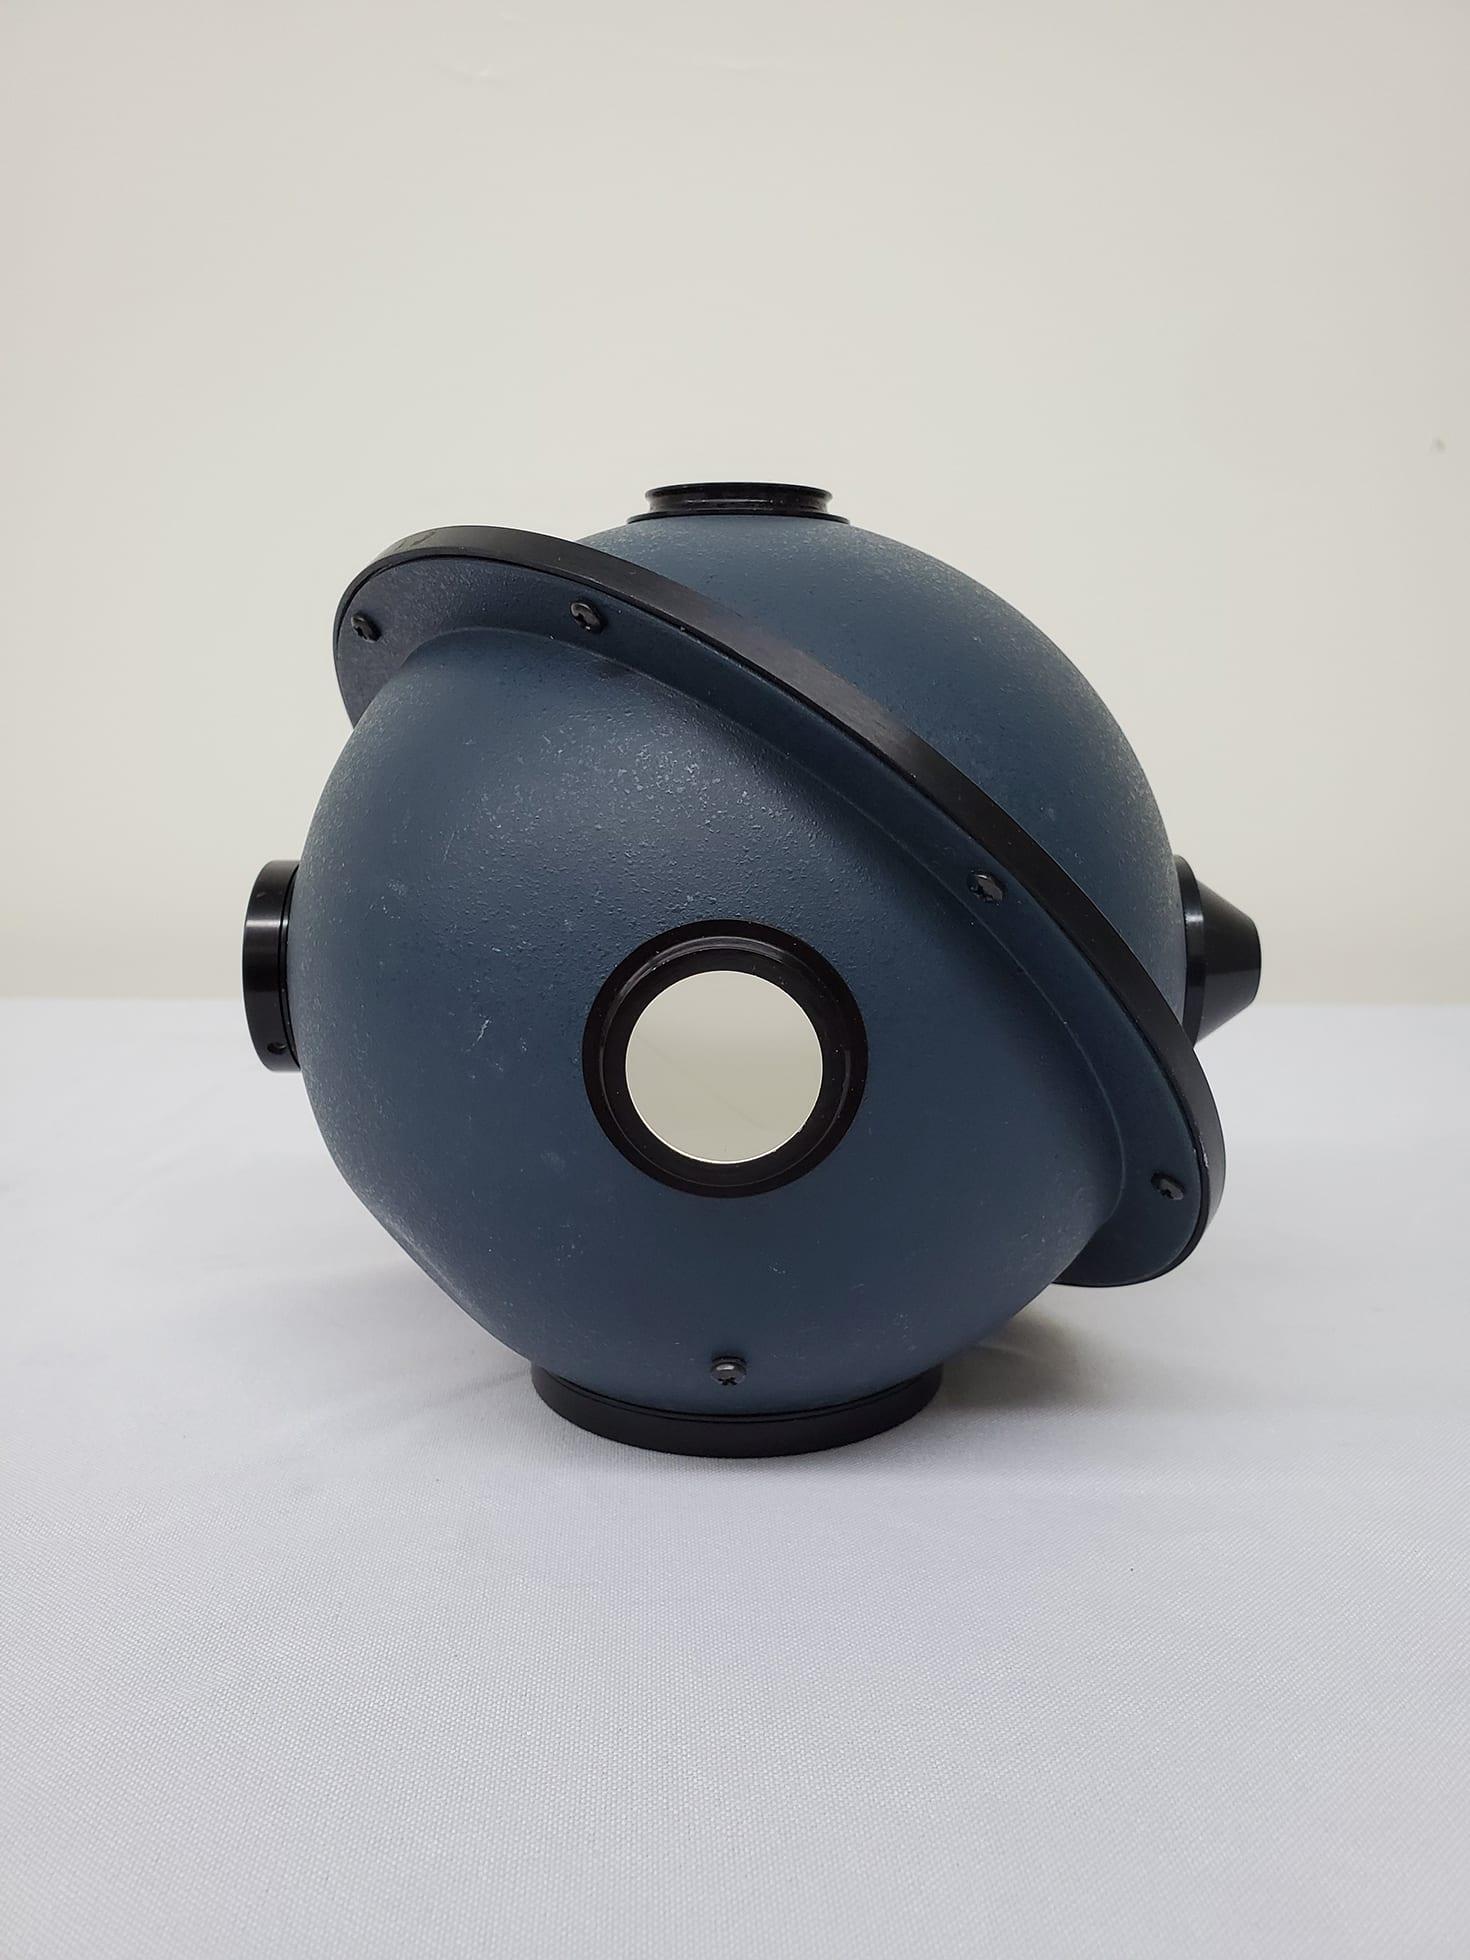 Buy Newport-819 C-Spectralon Collimated Beam Integrating Sphere-54578